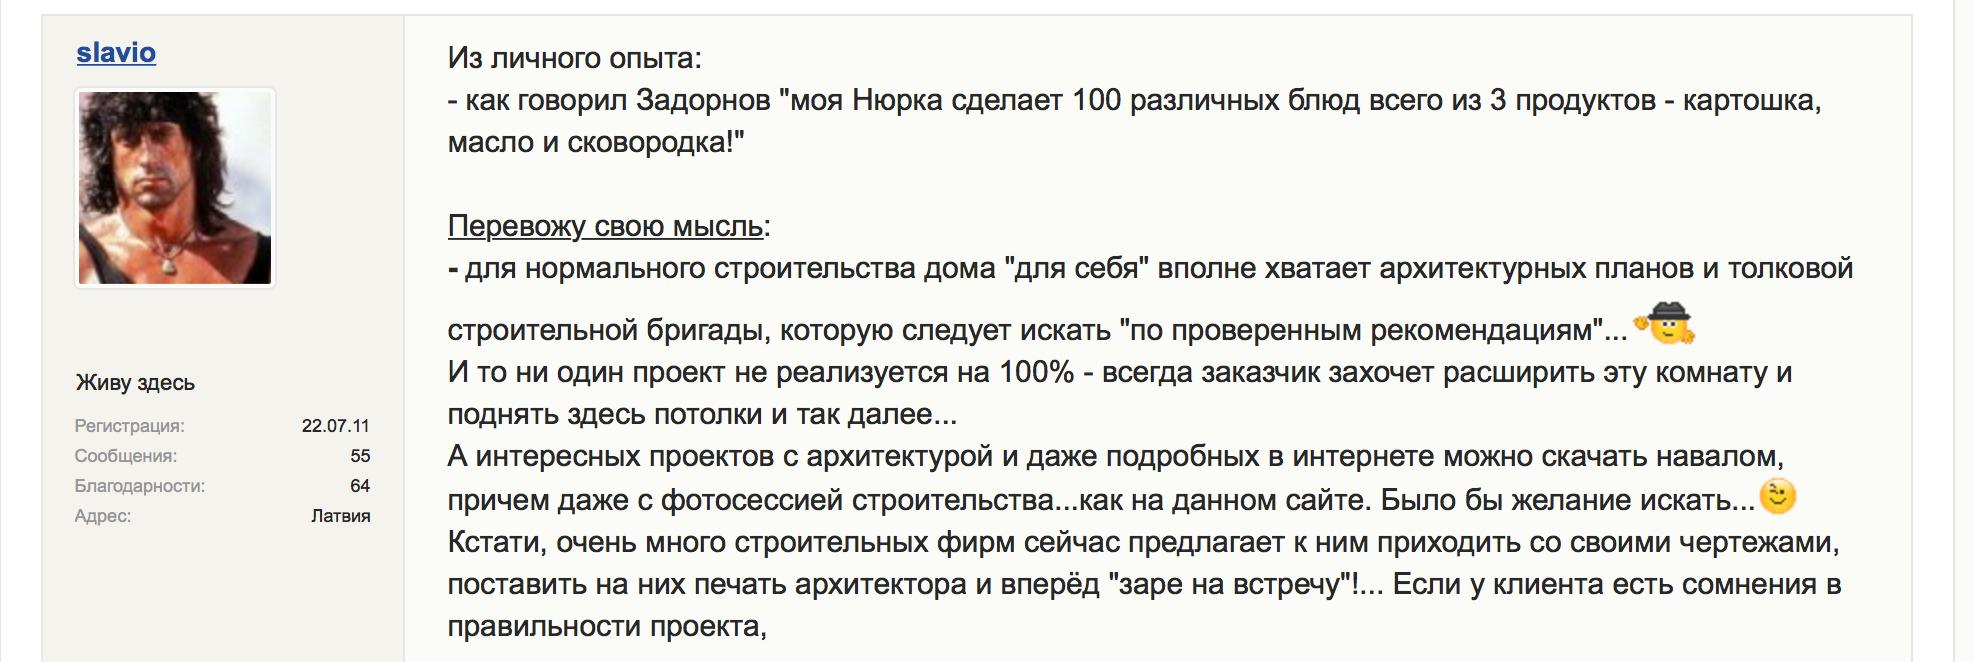 скриншот форухауса